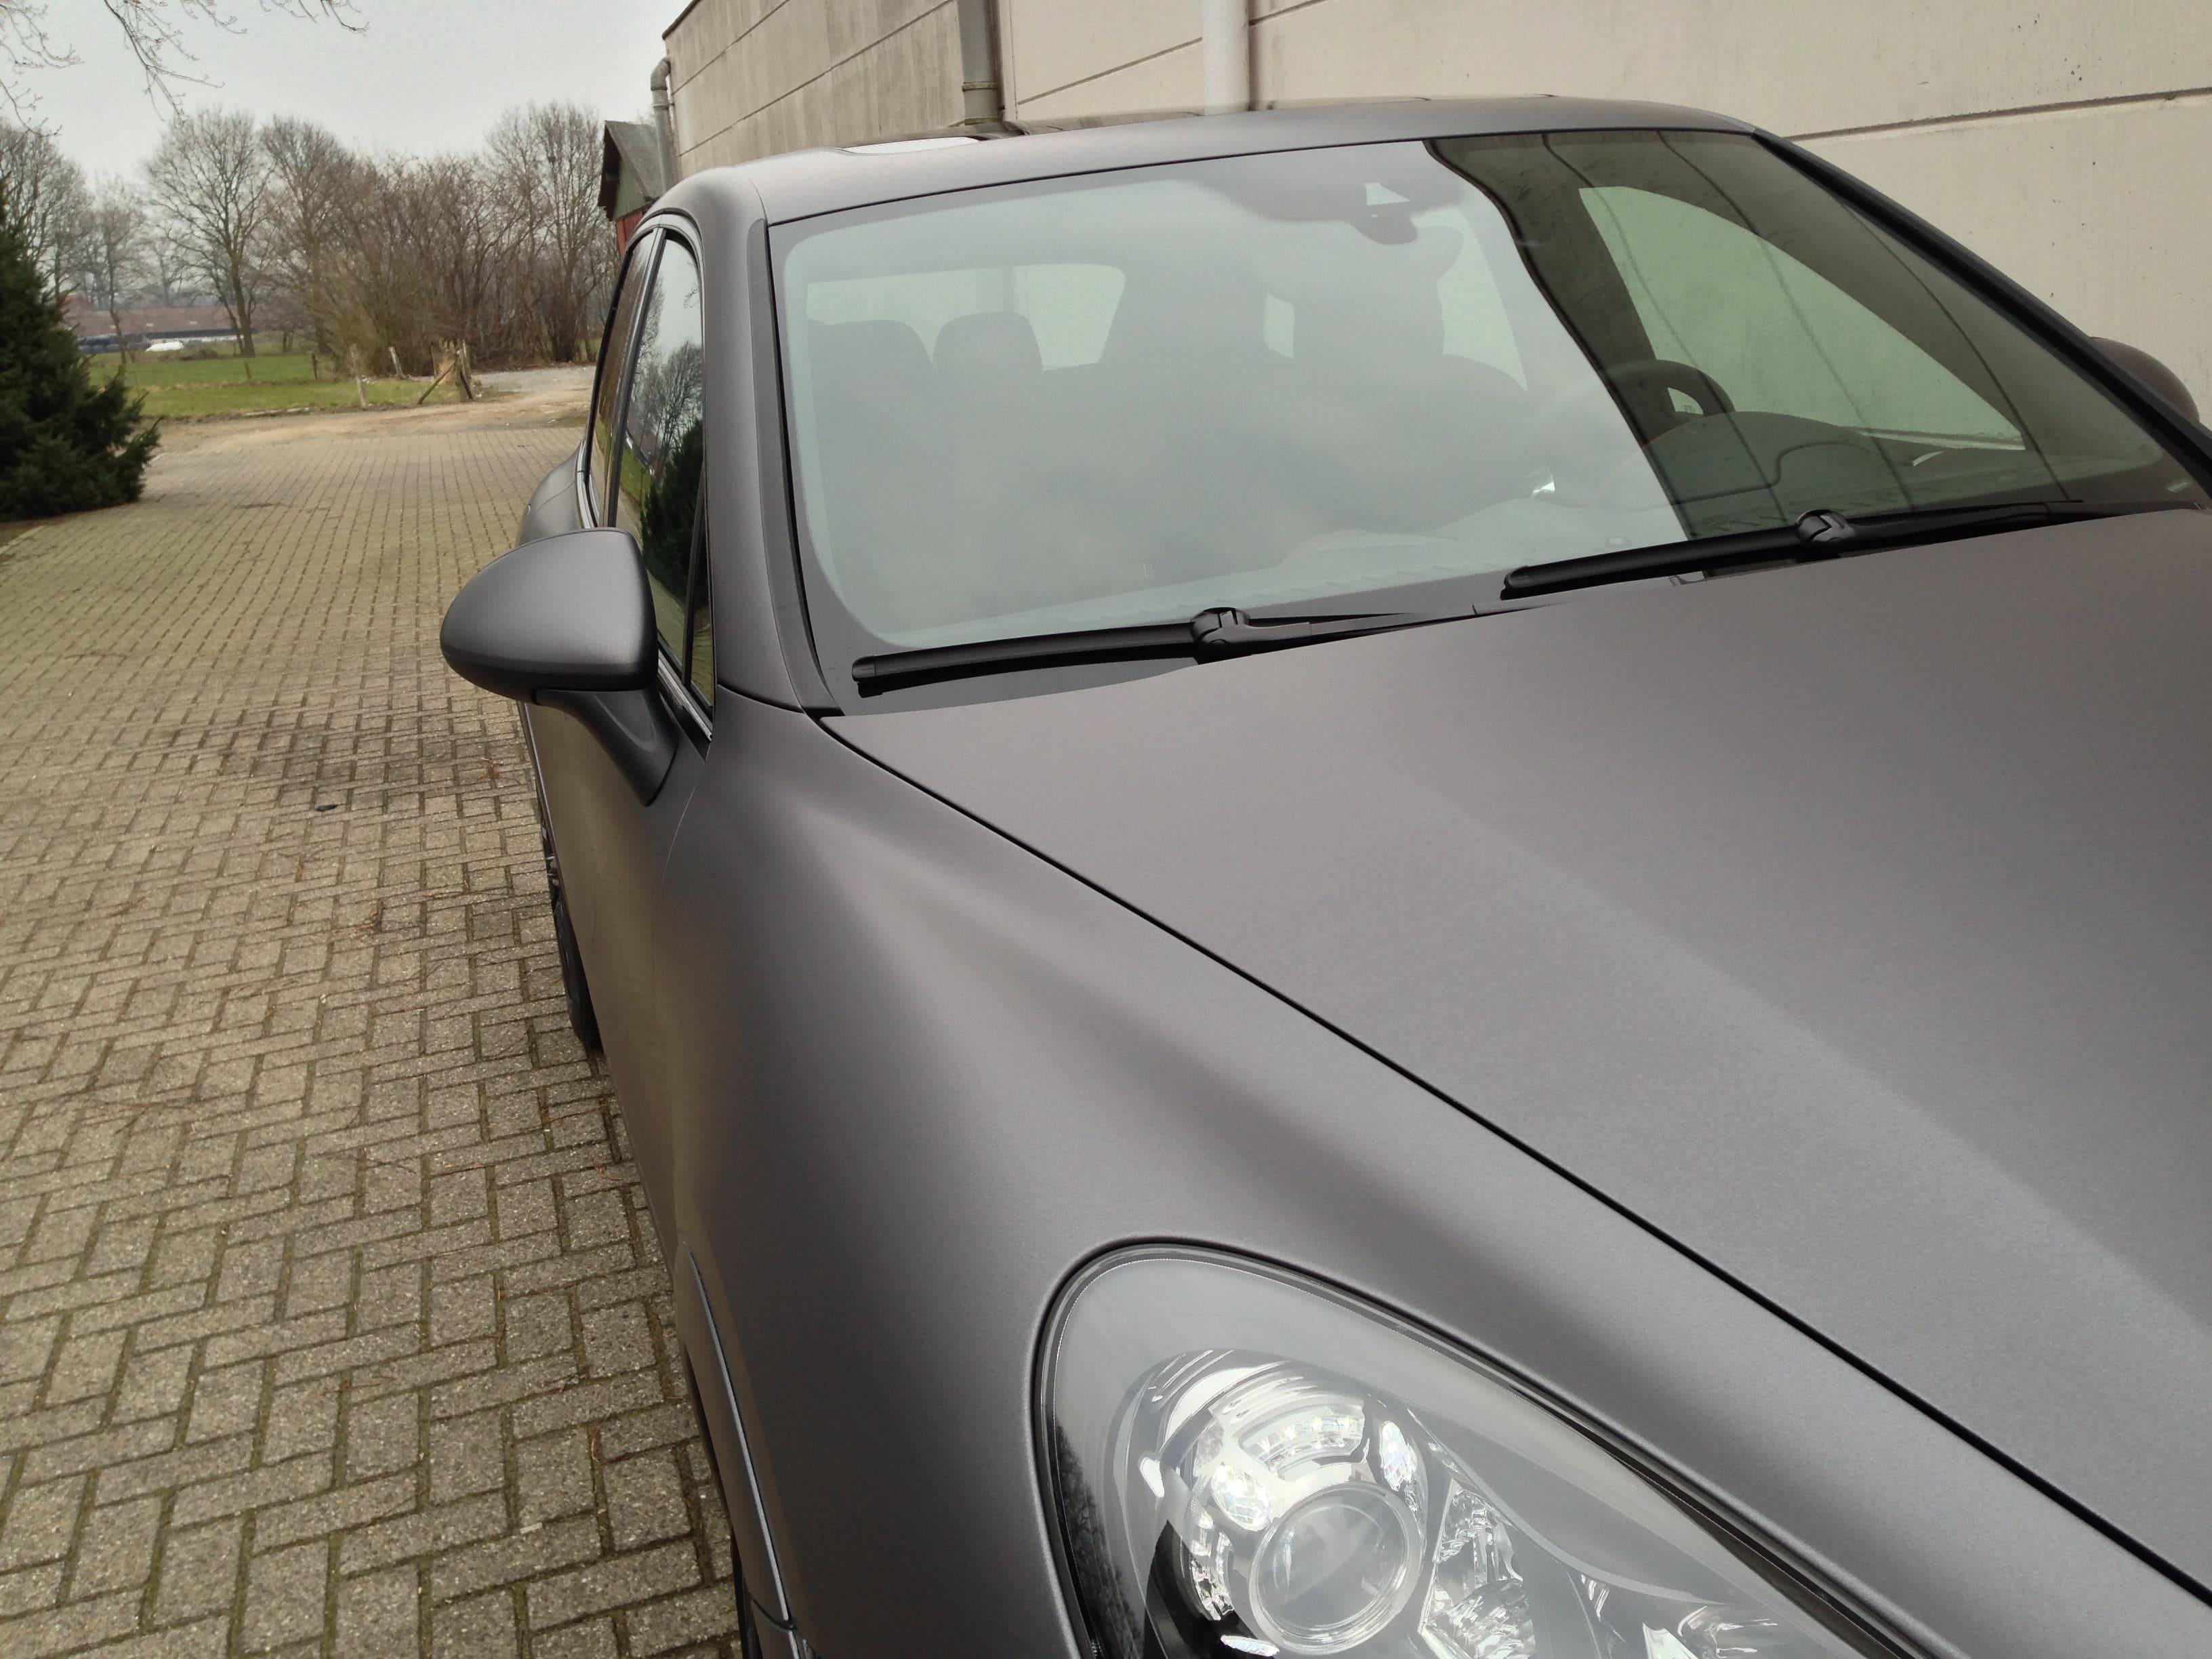 Porsche Cayenne GTS met Gunpowder Wrap, Carwrapping door Wrapmyride.nu Foto-nr:6770, ©2020